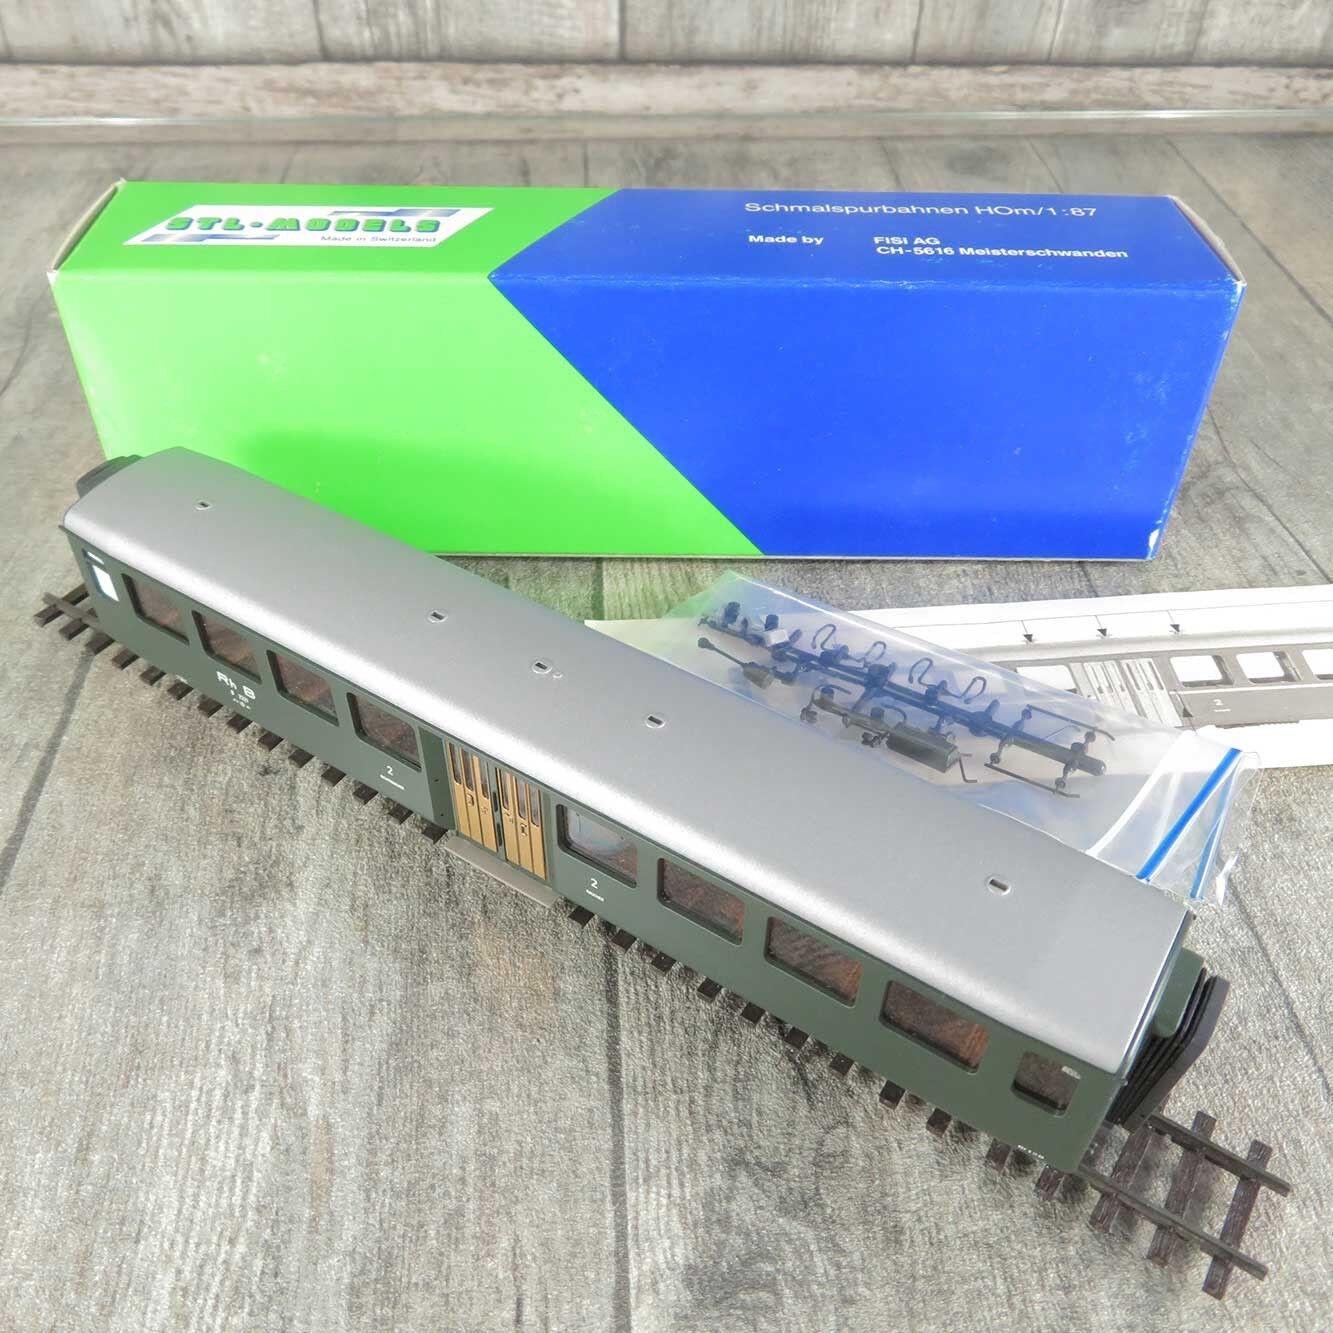 STL-Models 2203 1 - H0m - Personenwagen - RhB - 2.Klasse - OVP -  C15567